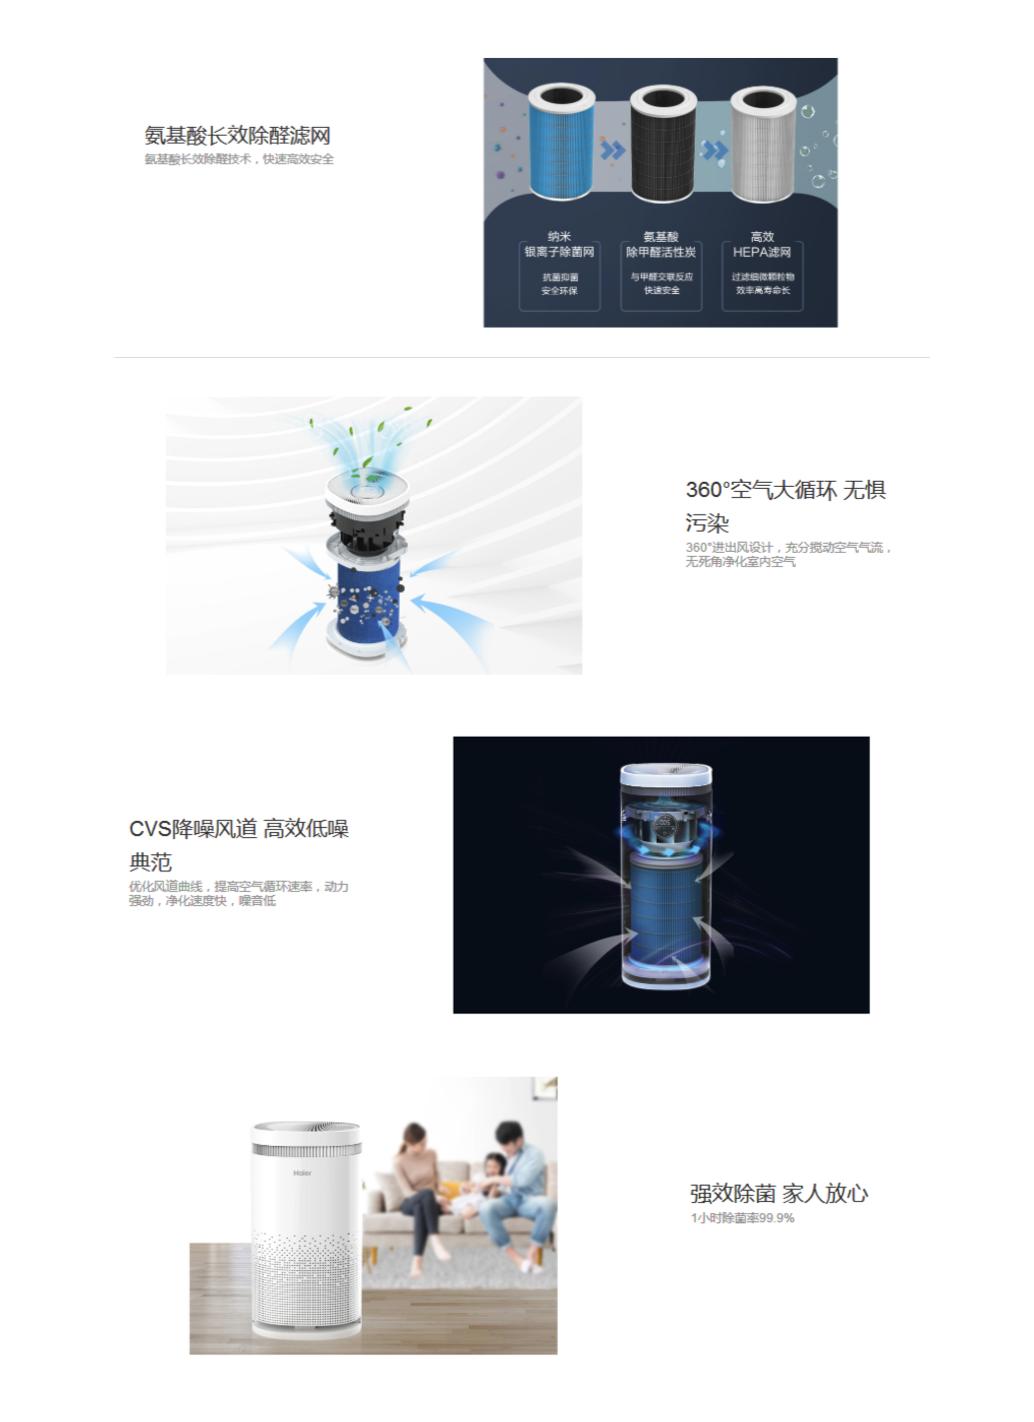 FireShot Capture 3 - 河南省政府采购网上商城_ - http___222.143.21.205_8081_product_.png